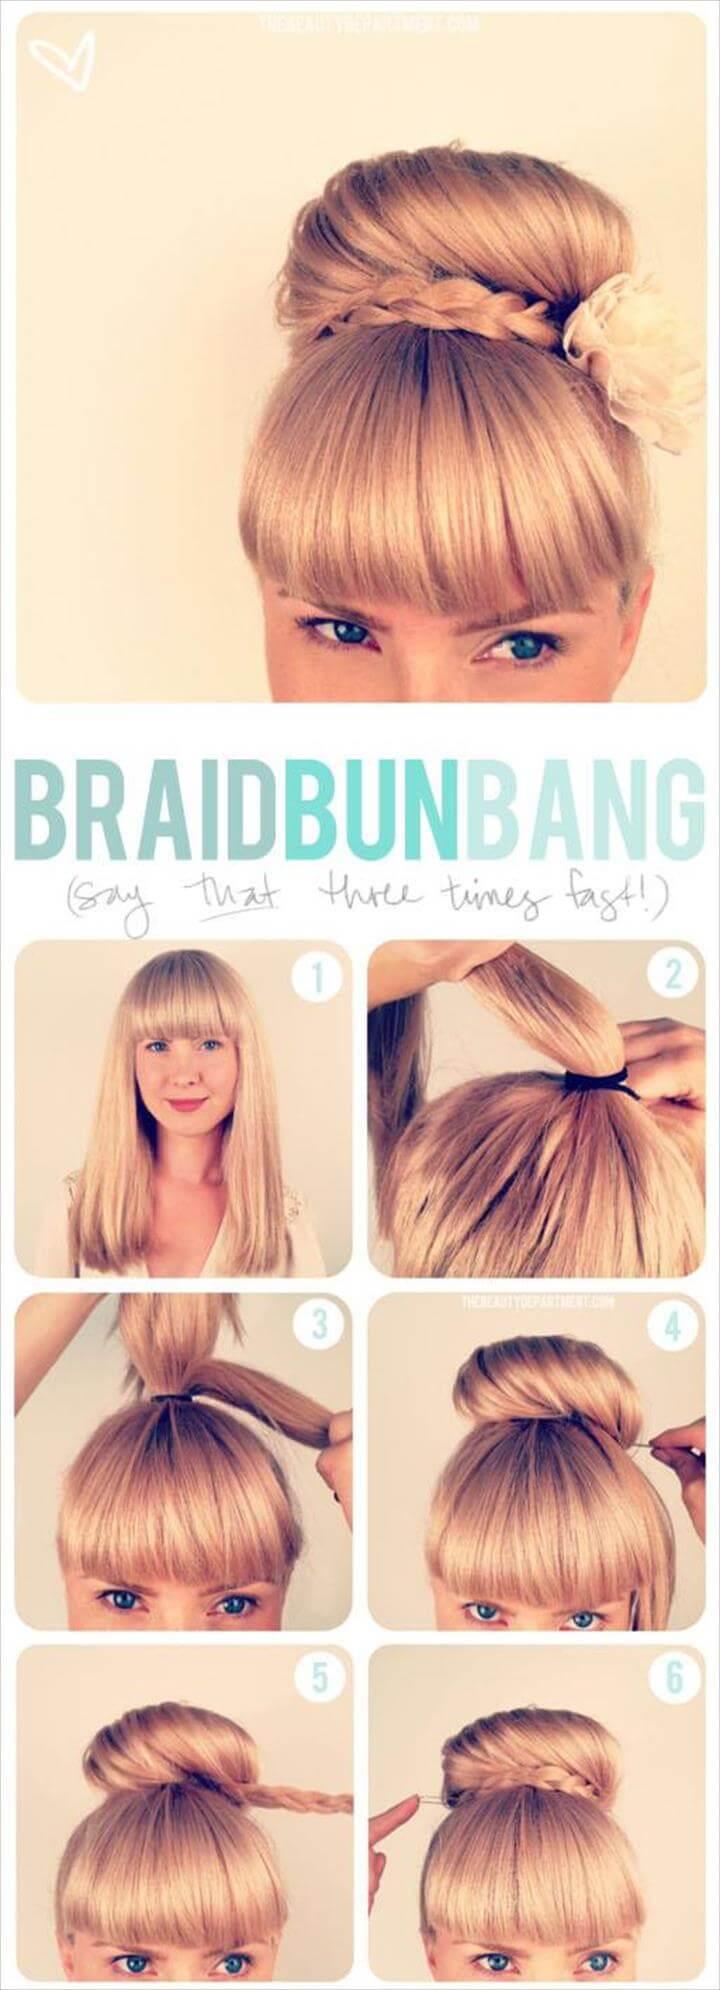 linda trenza updo bun bang peinado